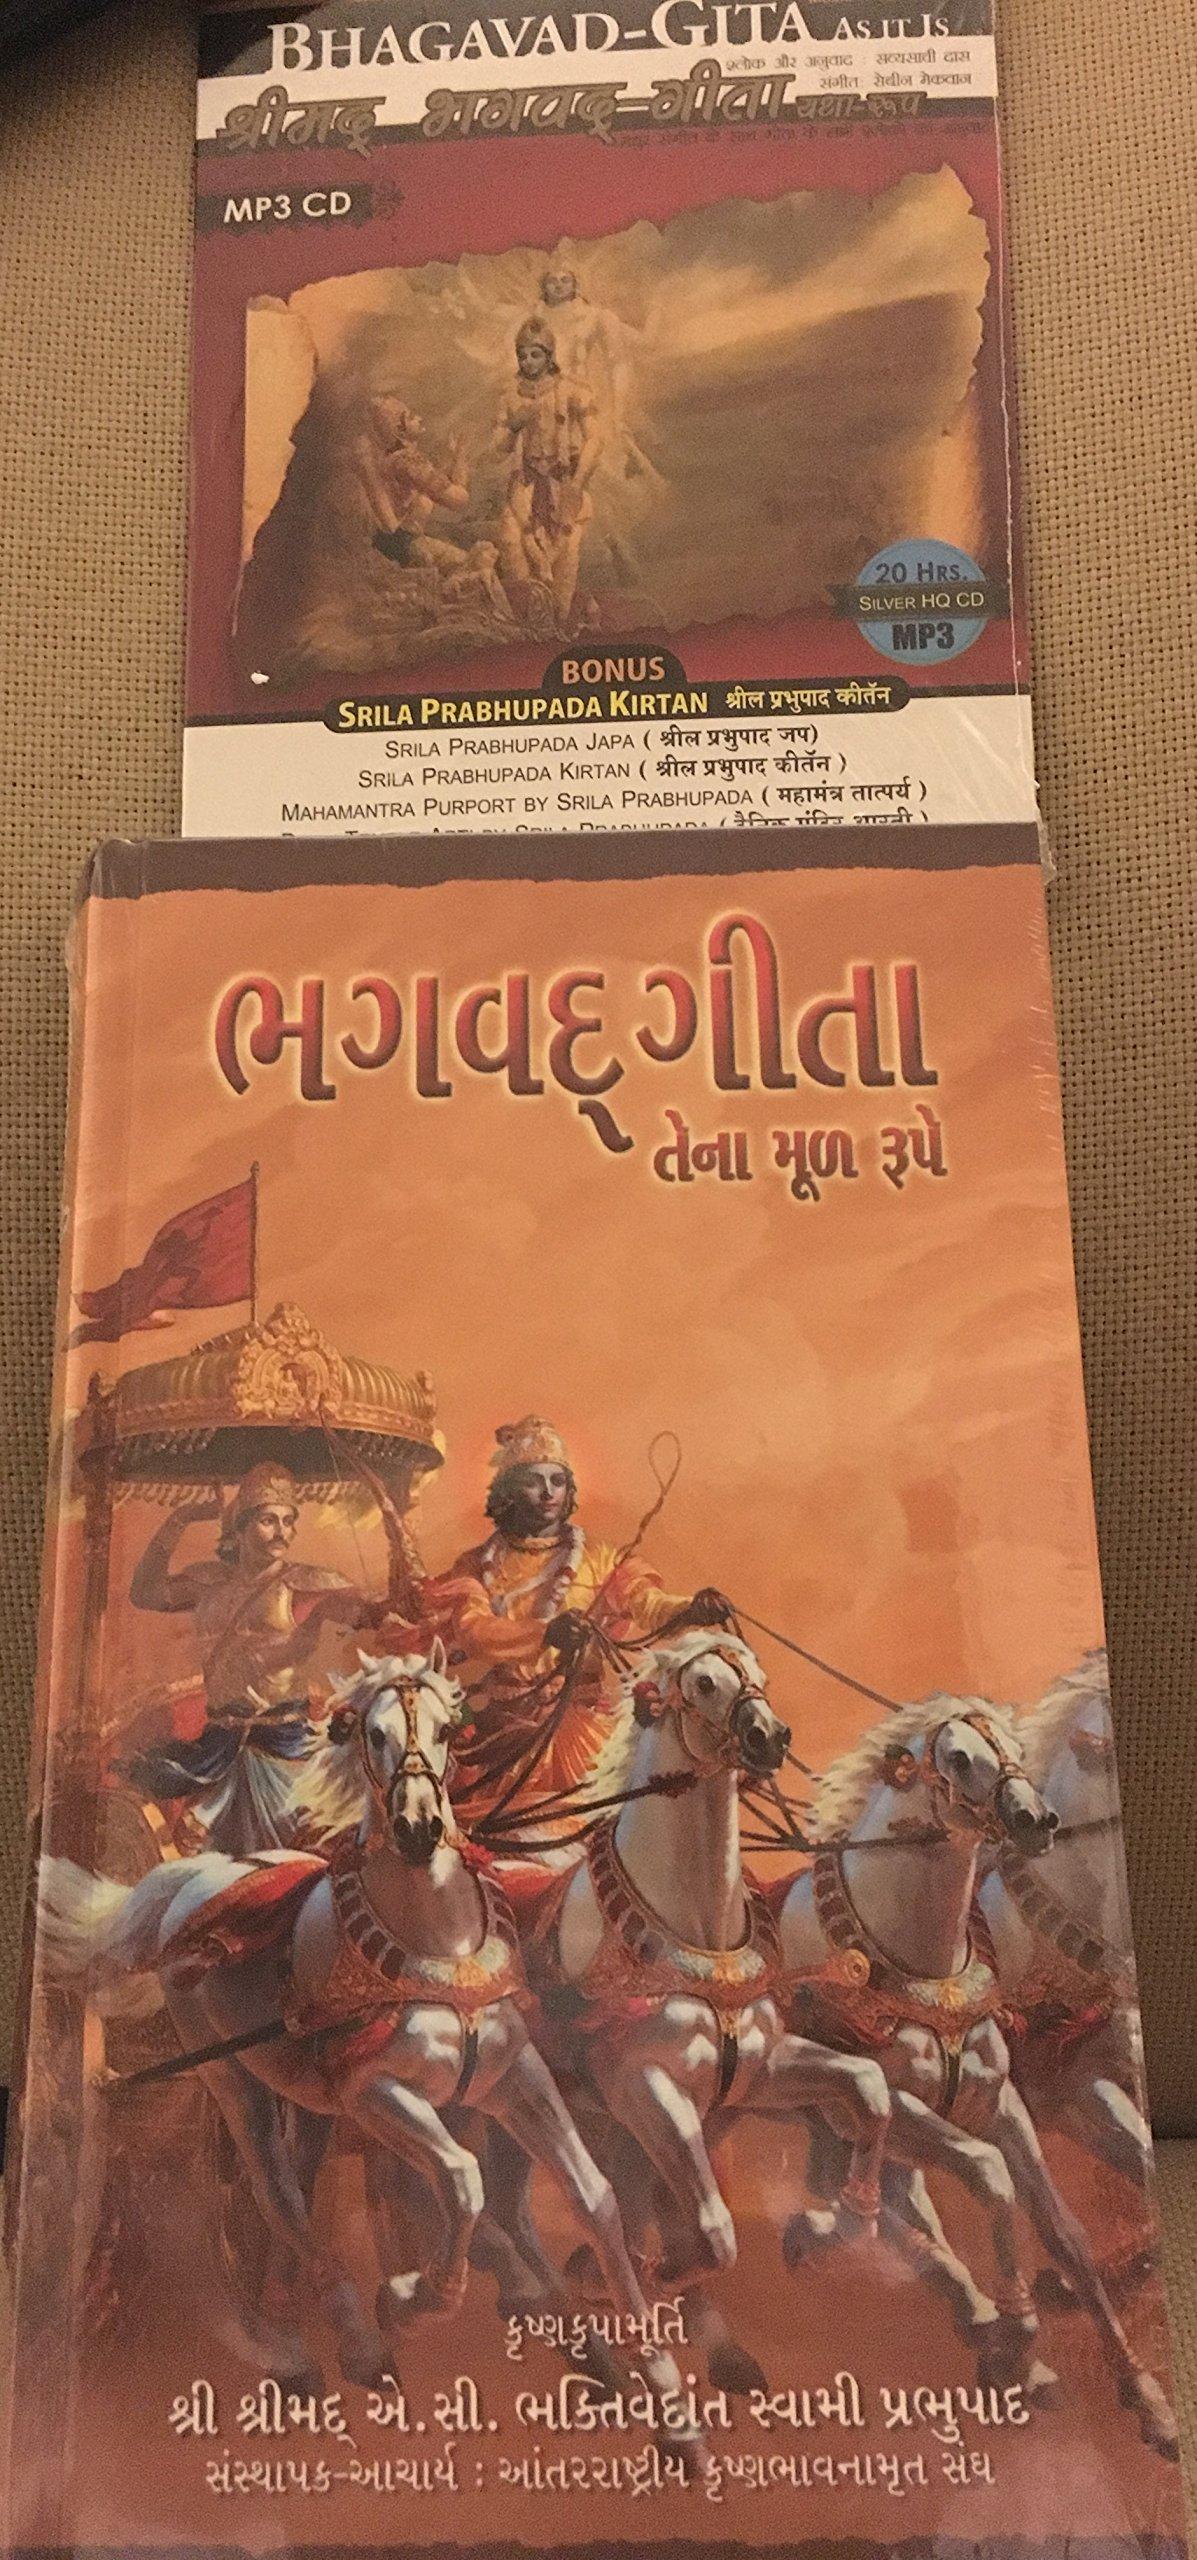 Bhagavad Gita As It Is (Gujarati) and Bhagavad-gita Cd & Book (Gujarati) PDF ePub fb2 book